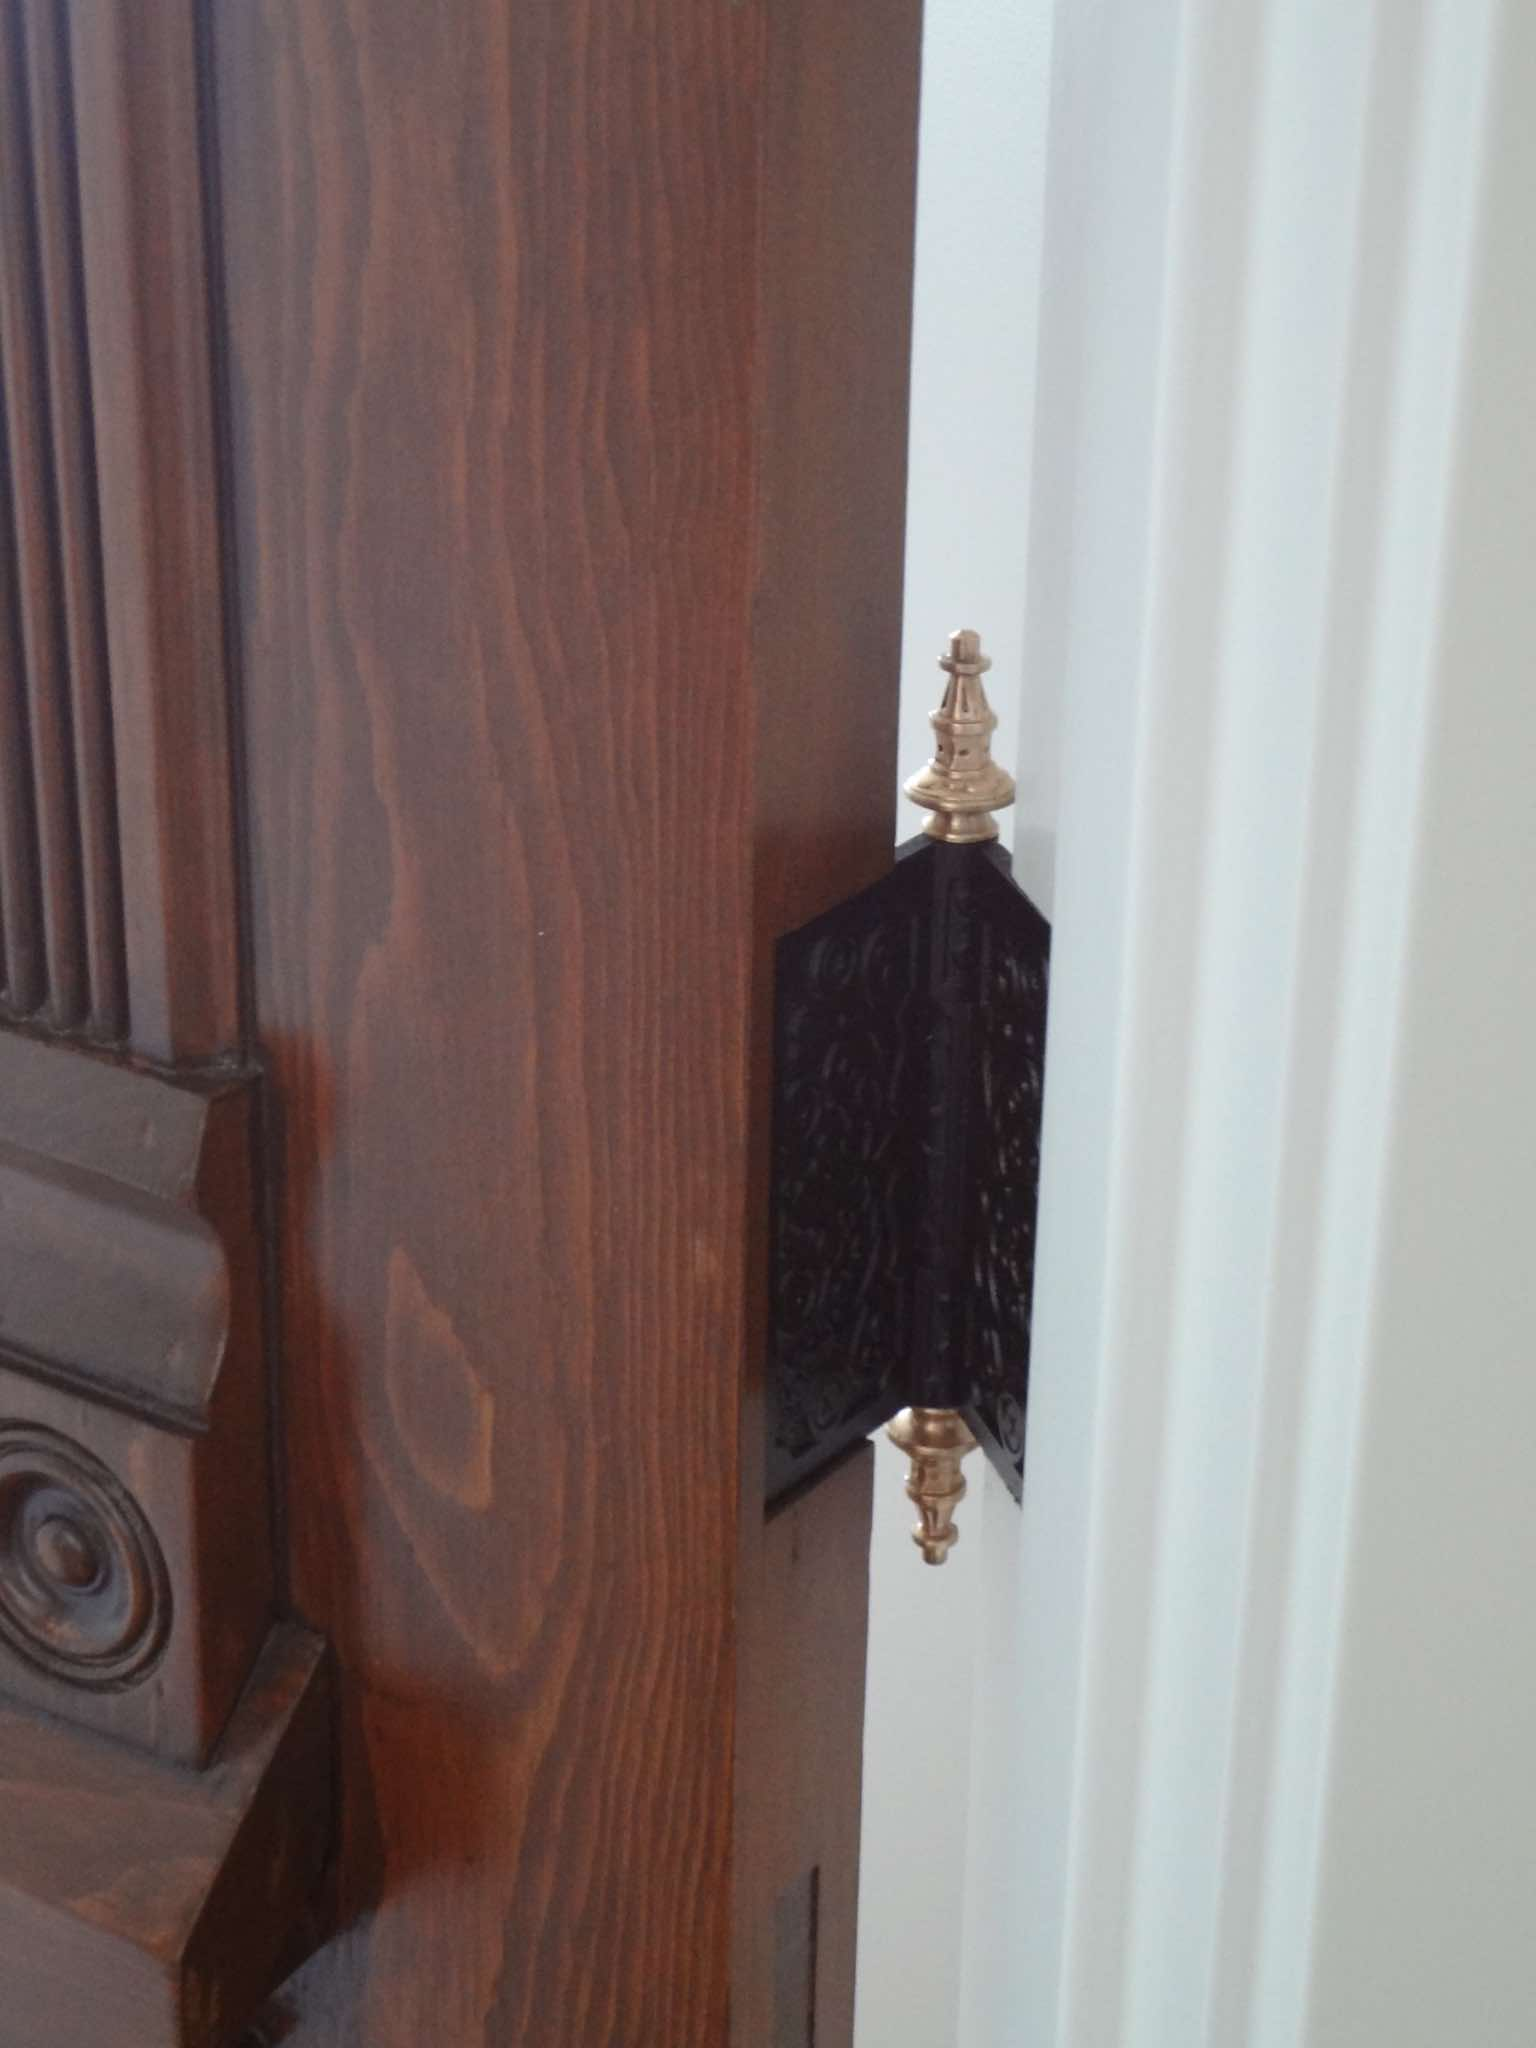 Antique Door Restoration - BEFORE. « > » « » - GALLERY Restoration DETAIL ETC... PAINTING